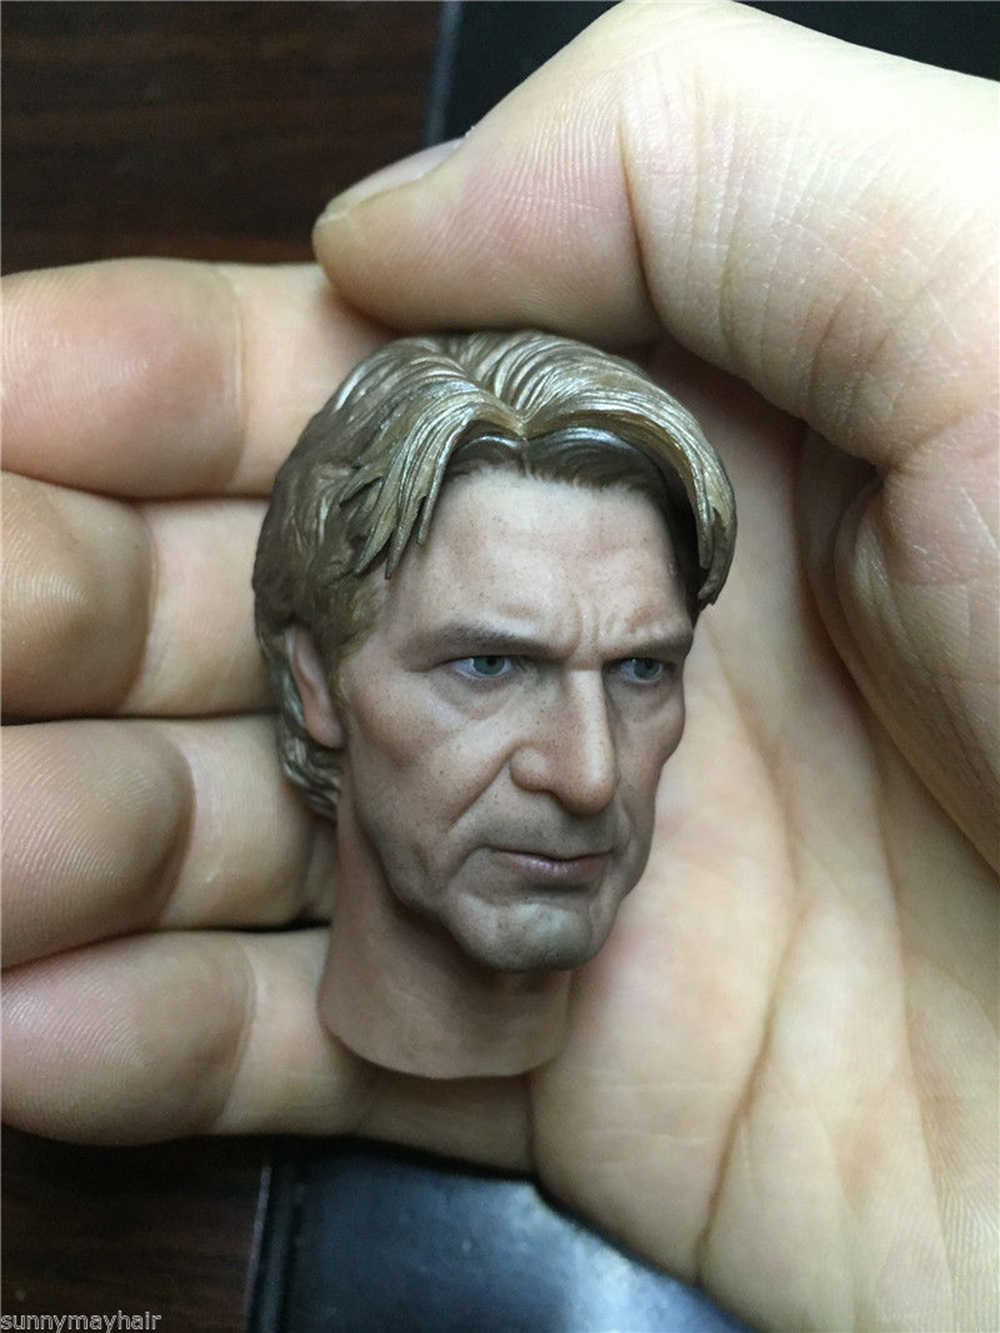 1//6 Scale Han Solo PVC Head Sculpt Harrison Ford Toy Fit 12/'/' Male Action Figure